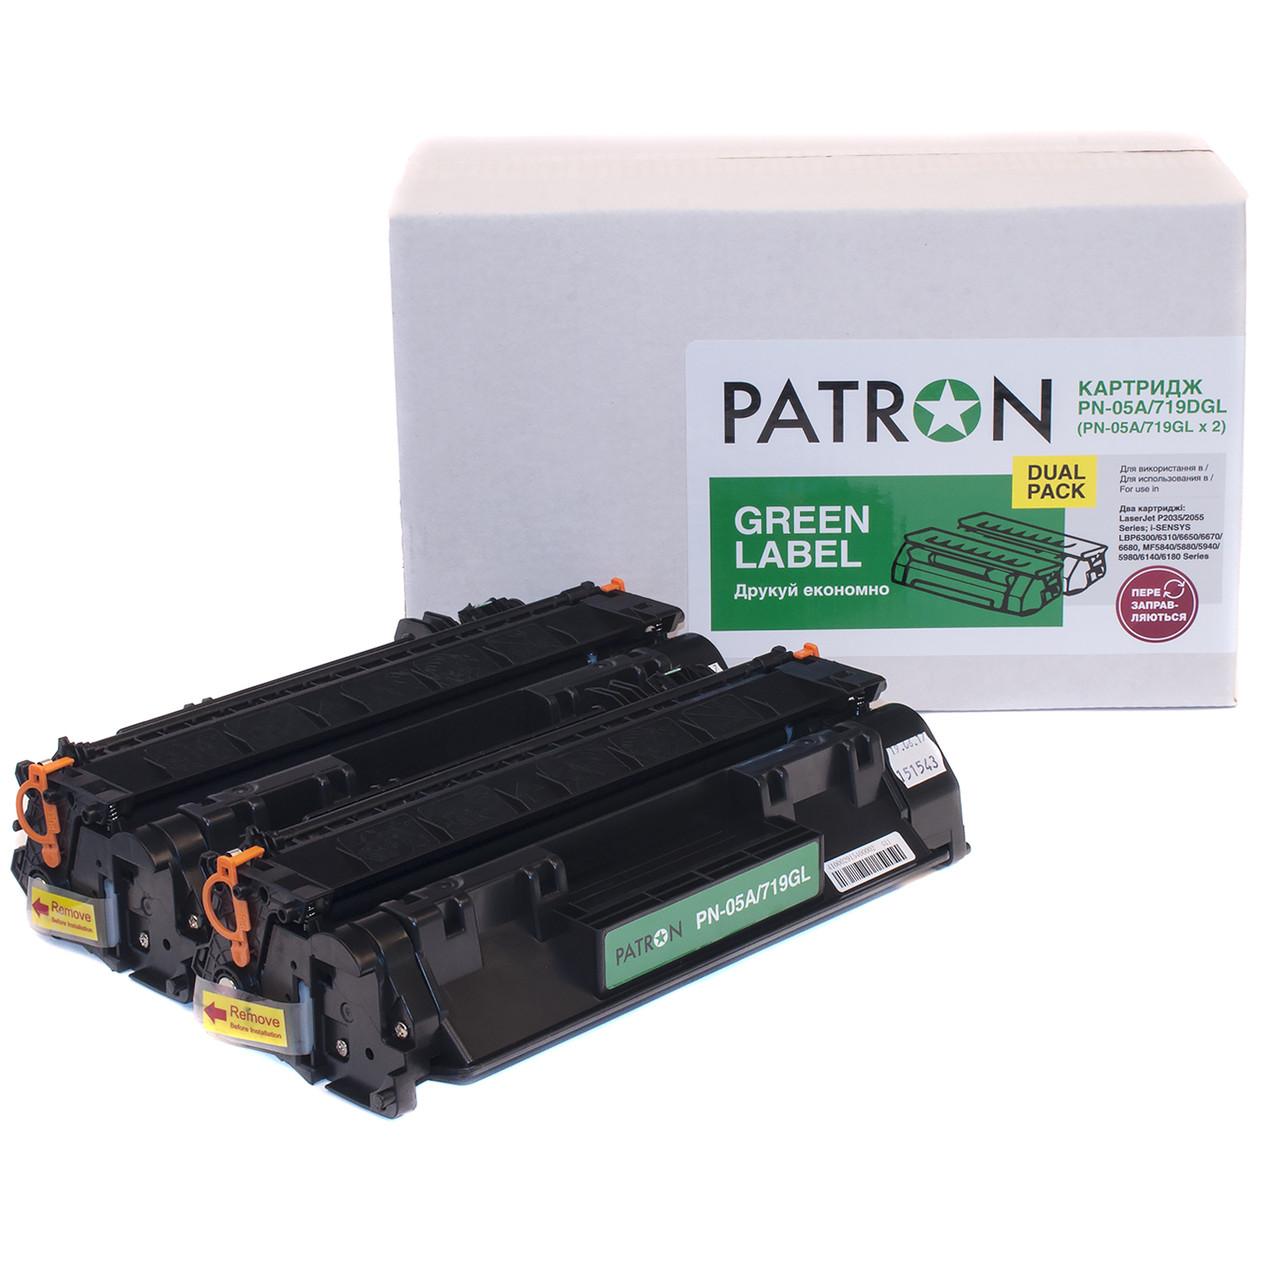 Картридж (комплект 2 шт) HP 05A (CE505A), Black, P2035/P2055, 2.3k, Patron Green, Dual Pack (PN-05A/719DGL)